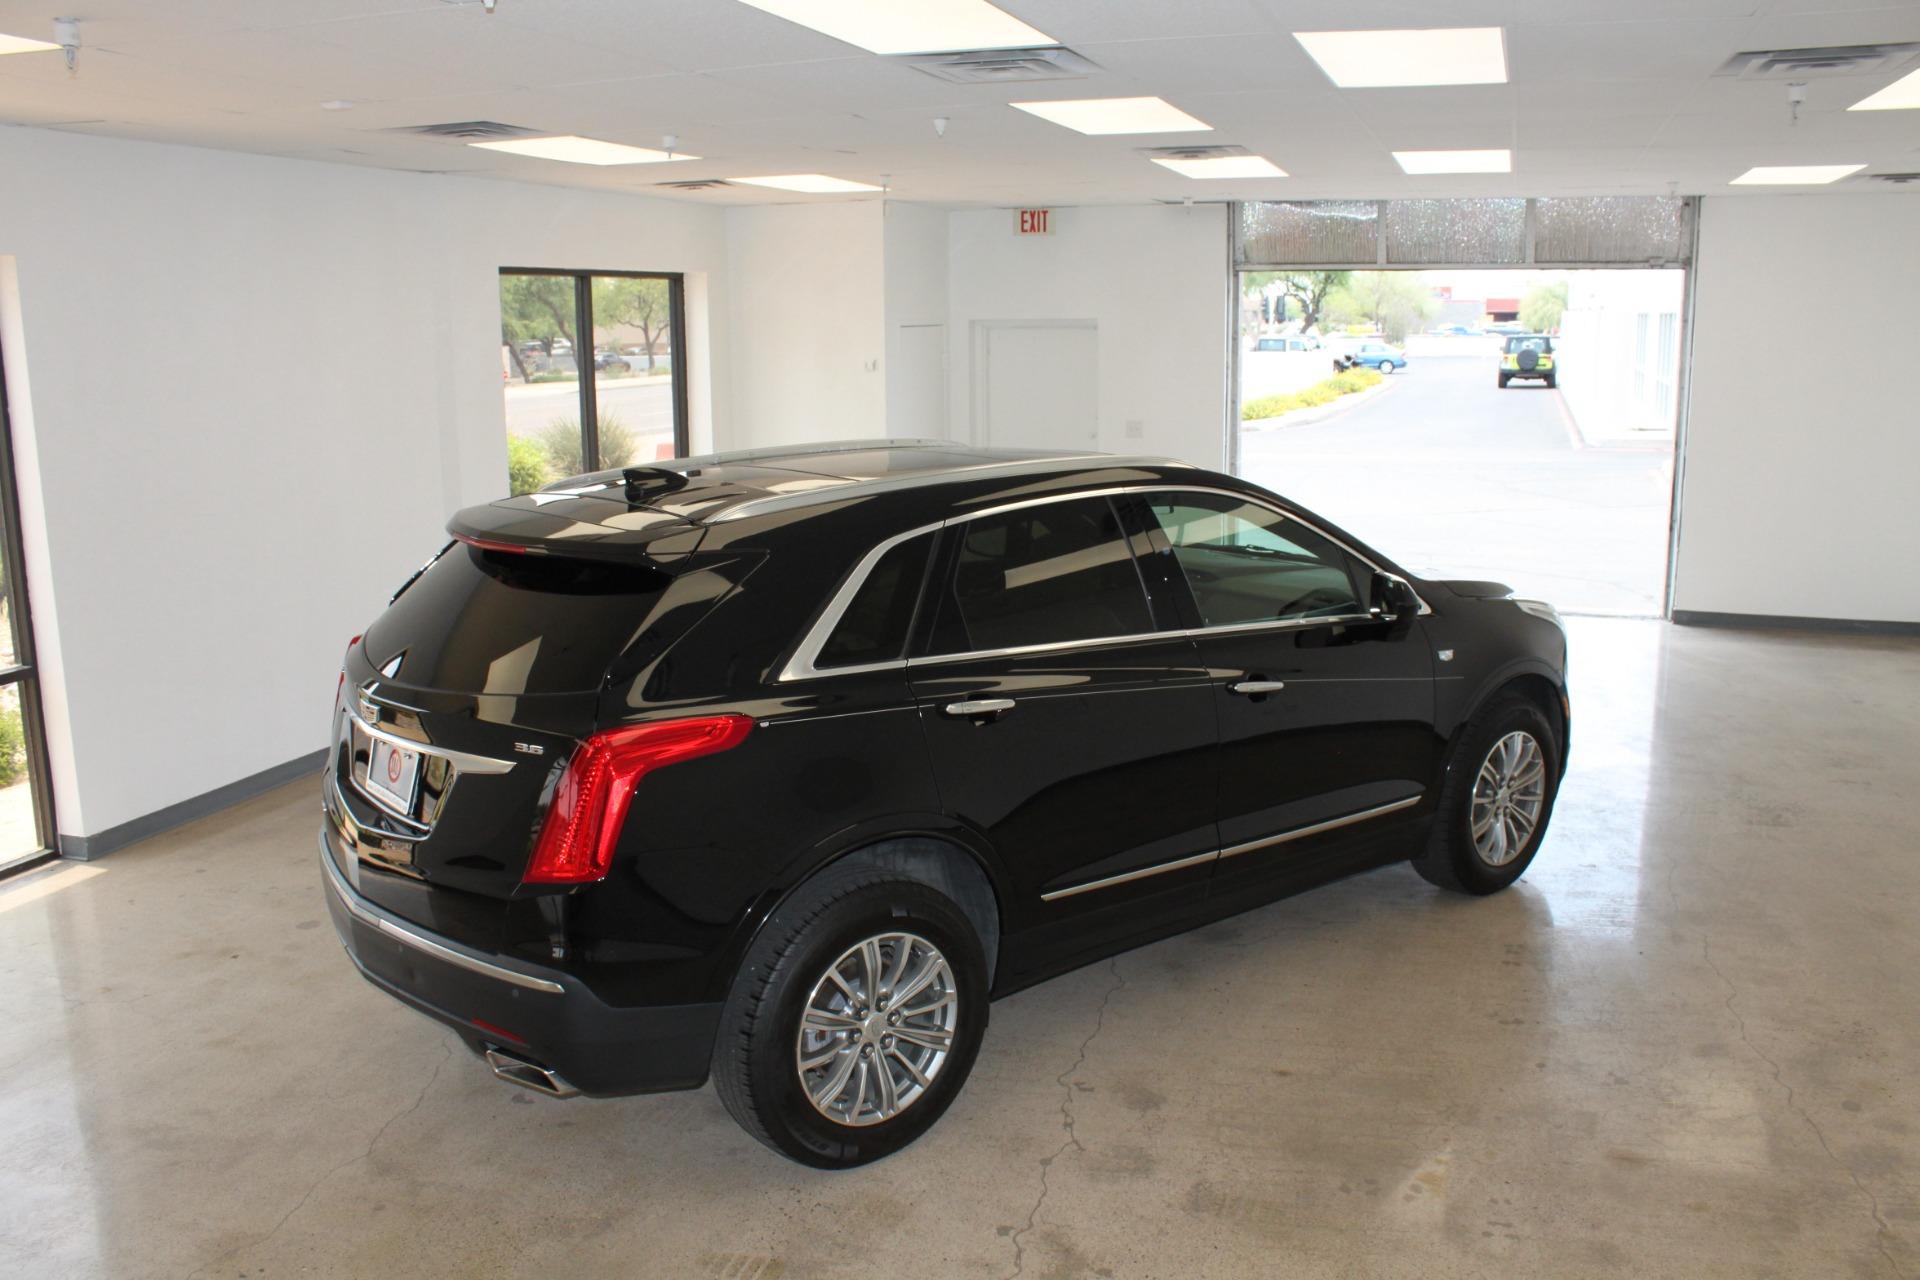 Used-2017-Cadillac-XT5-Luxury-All-Wheel-Drive-Luxury-AWD-Honda